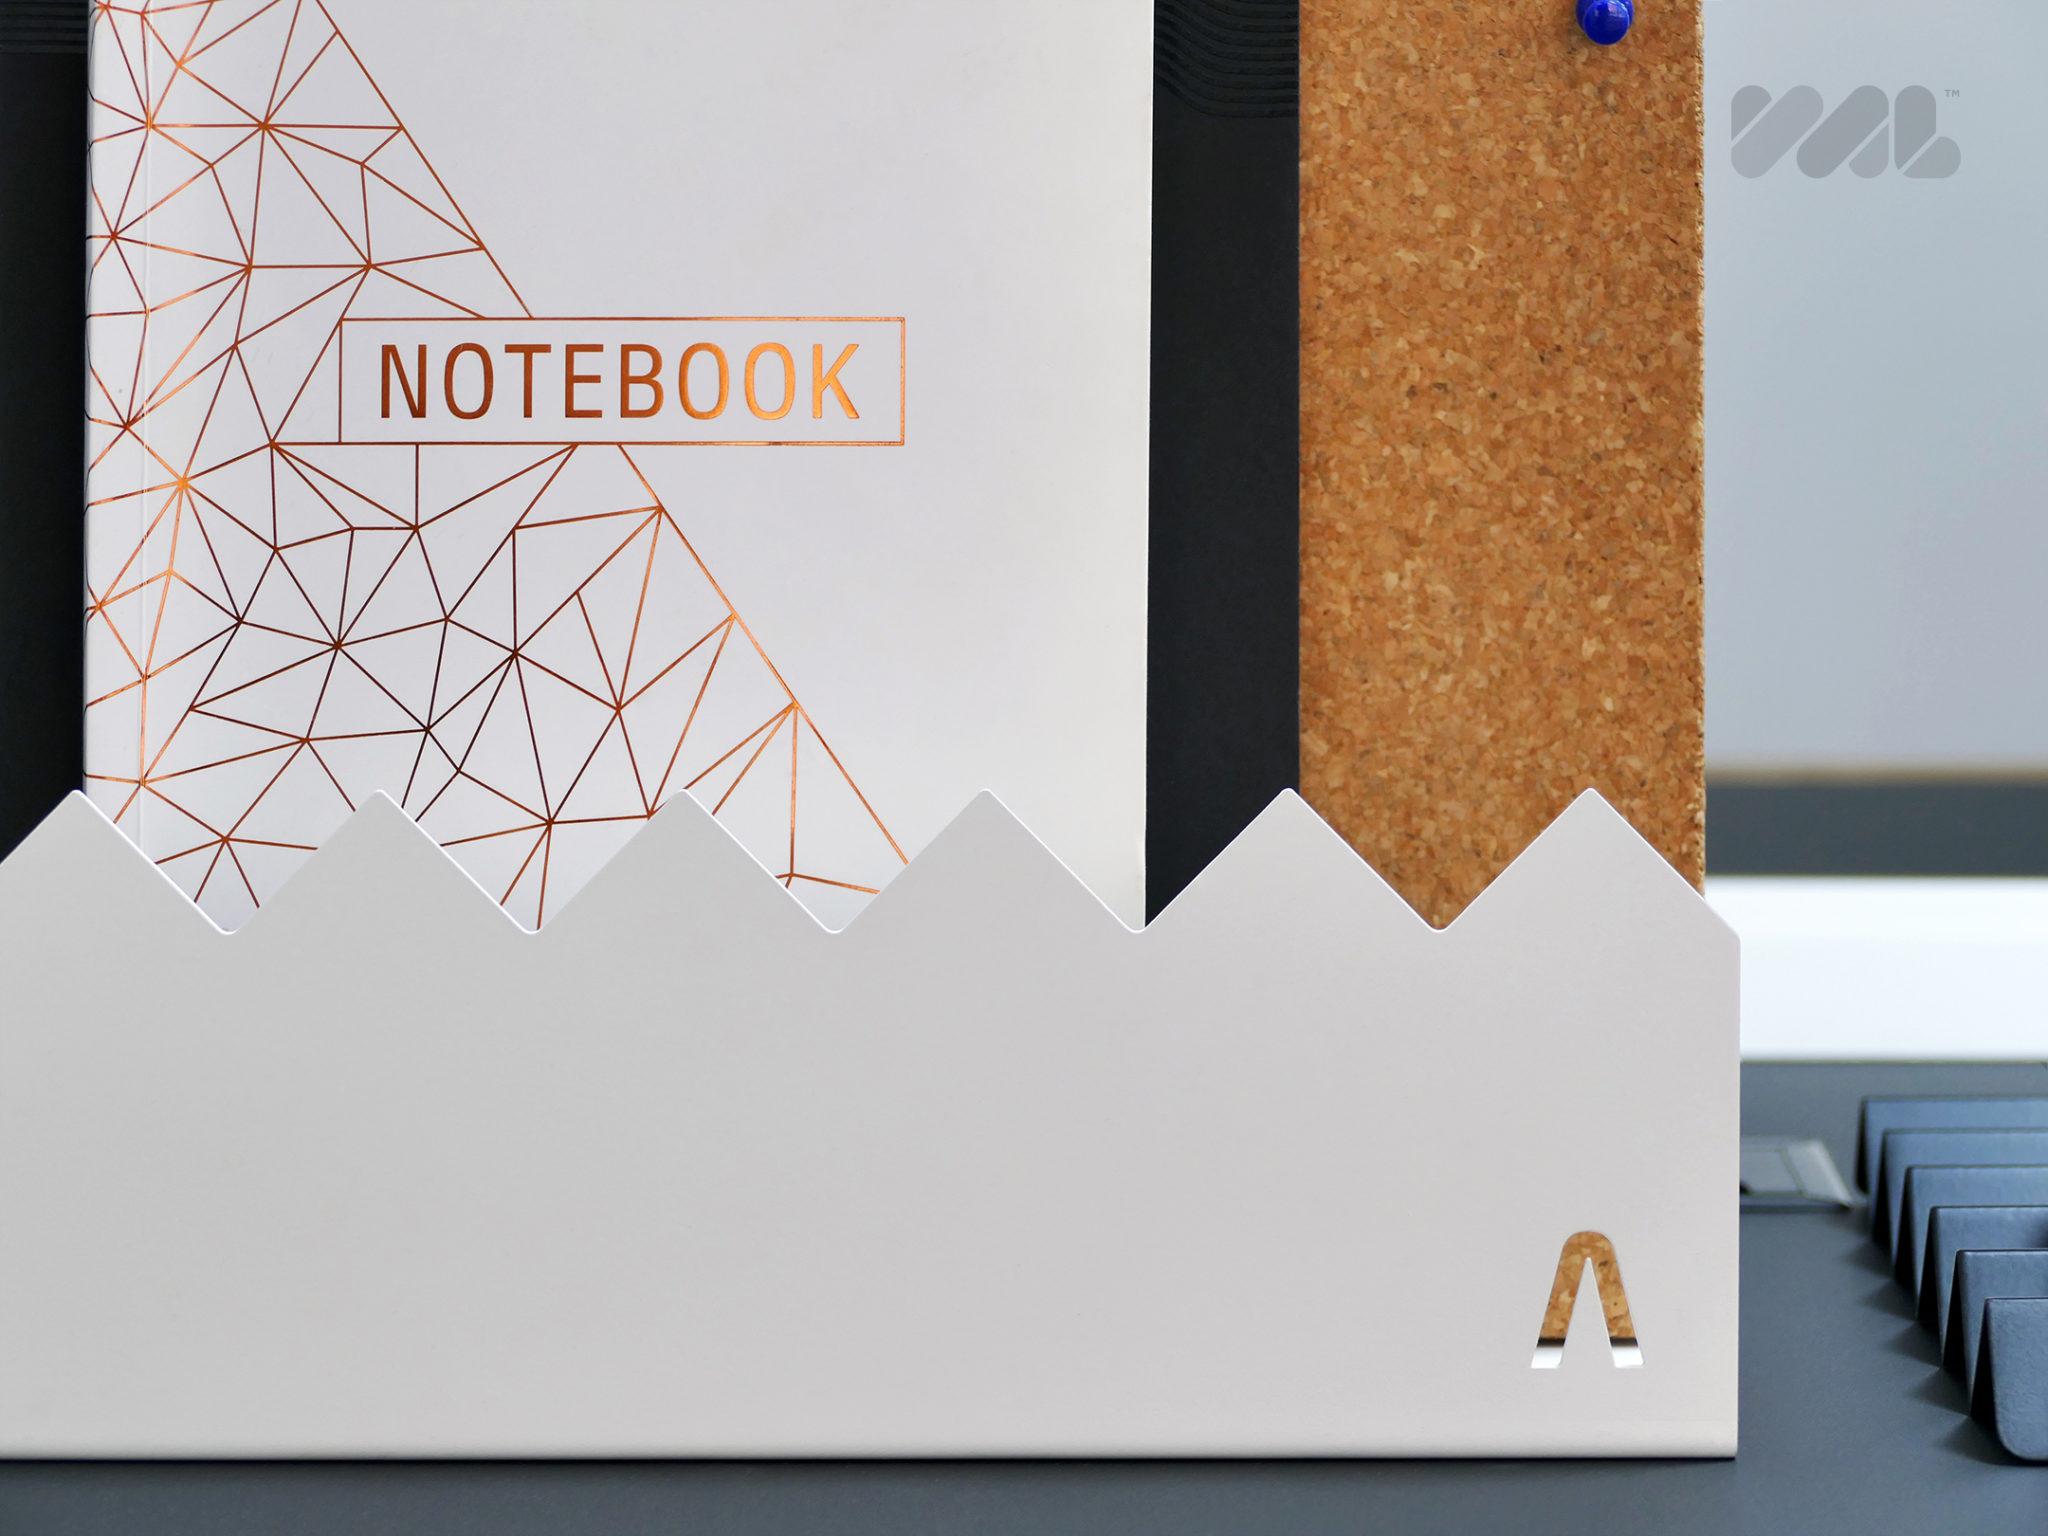 Val desk organizer - Val Dock by Abovus